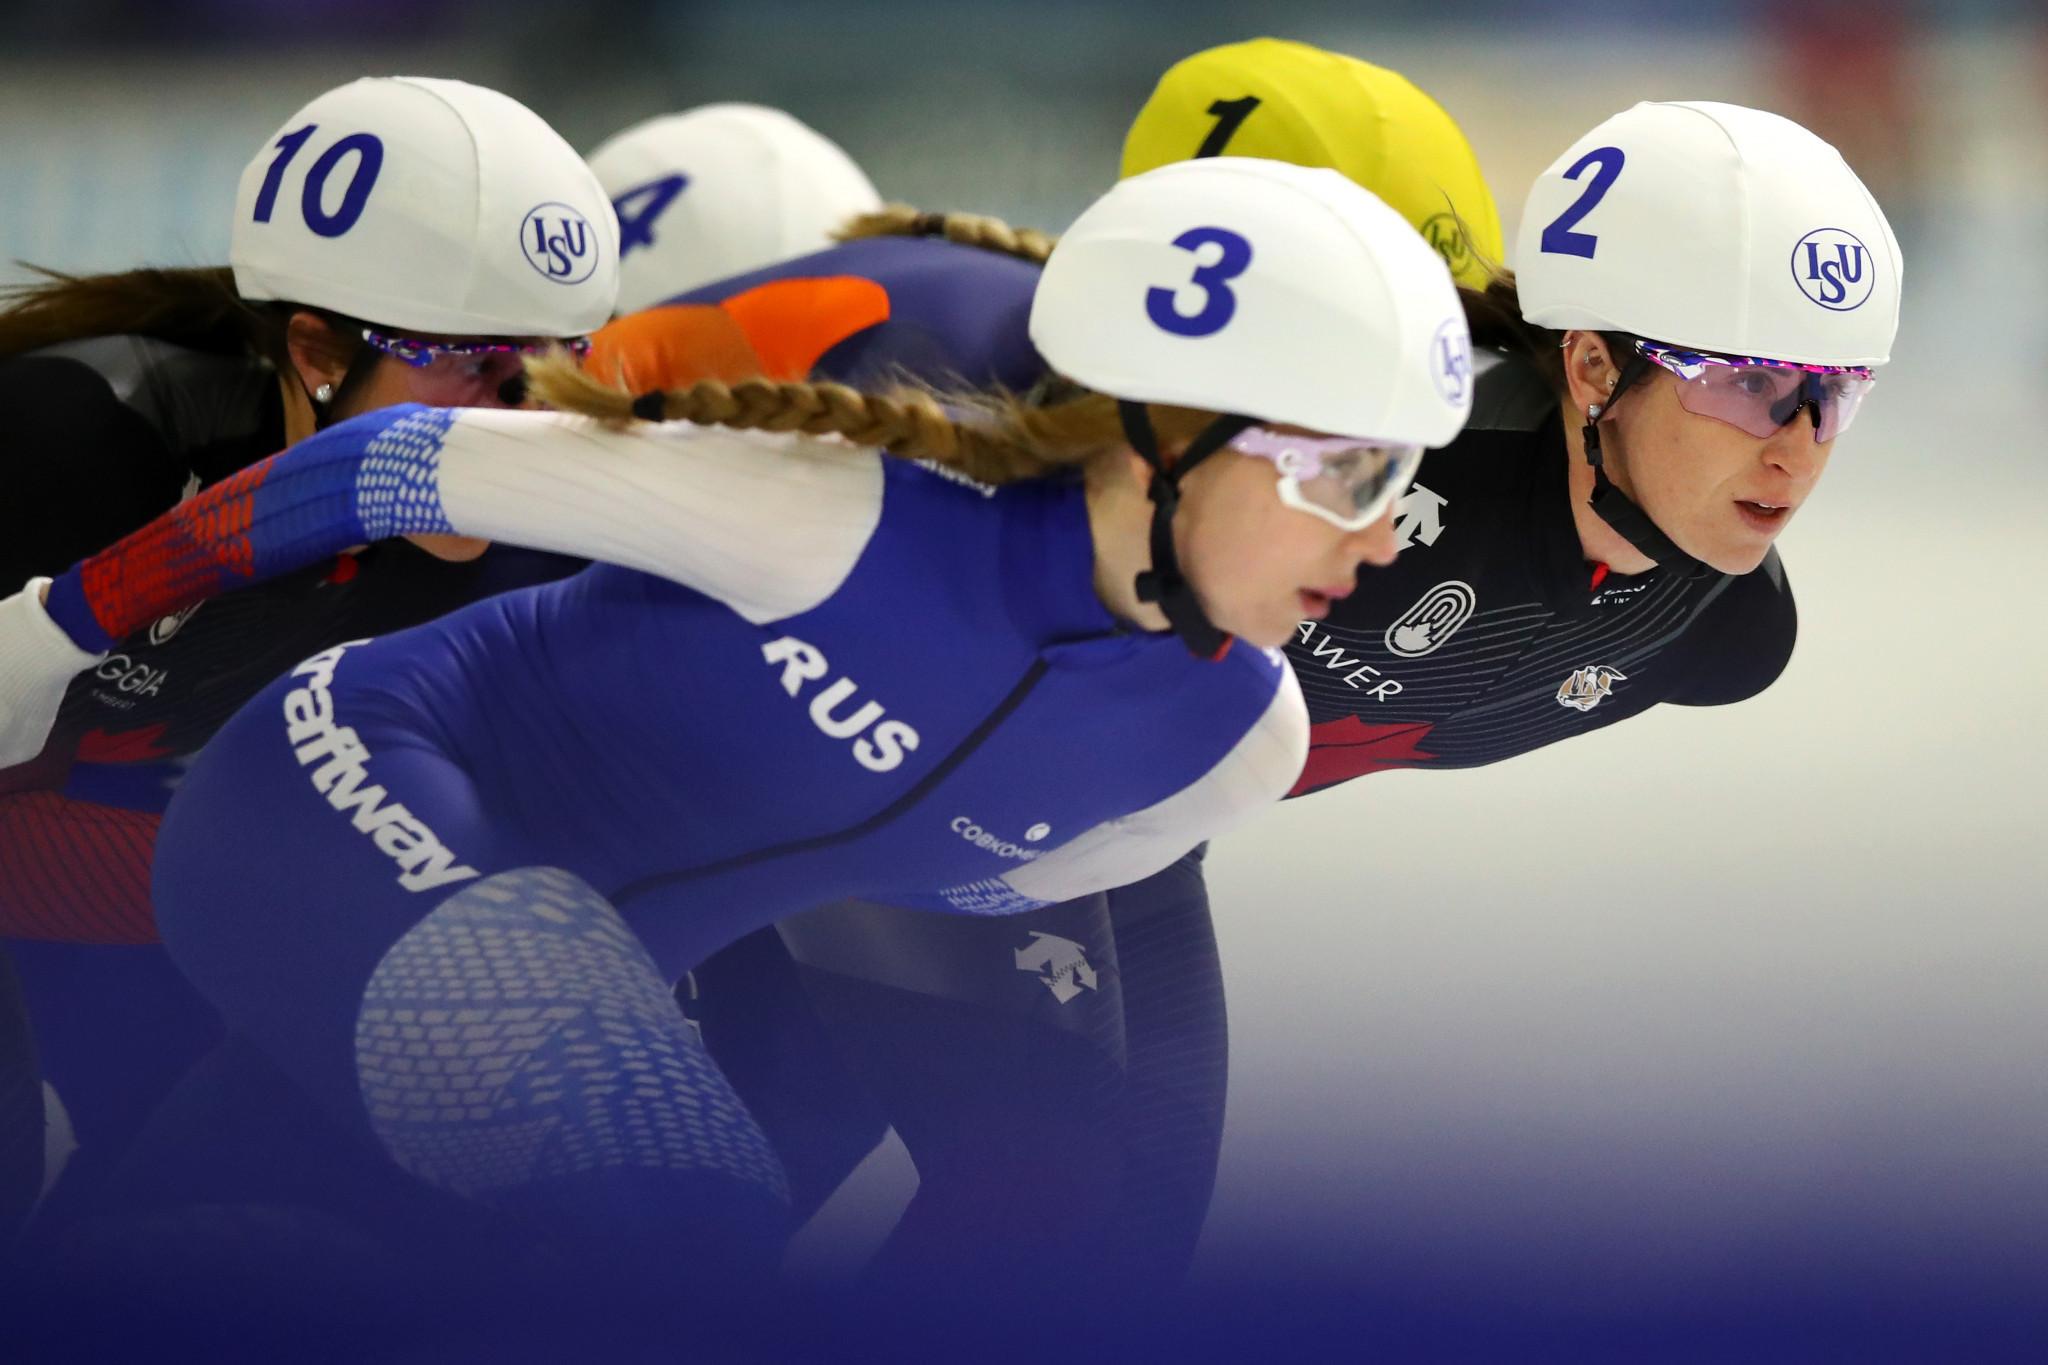 Fourteen titles available at ISU World Speed Skating Championships in Heerenveen